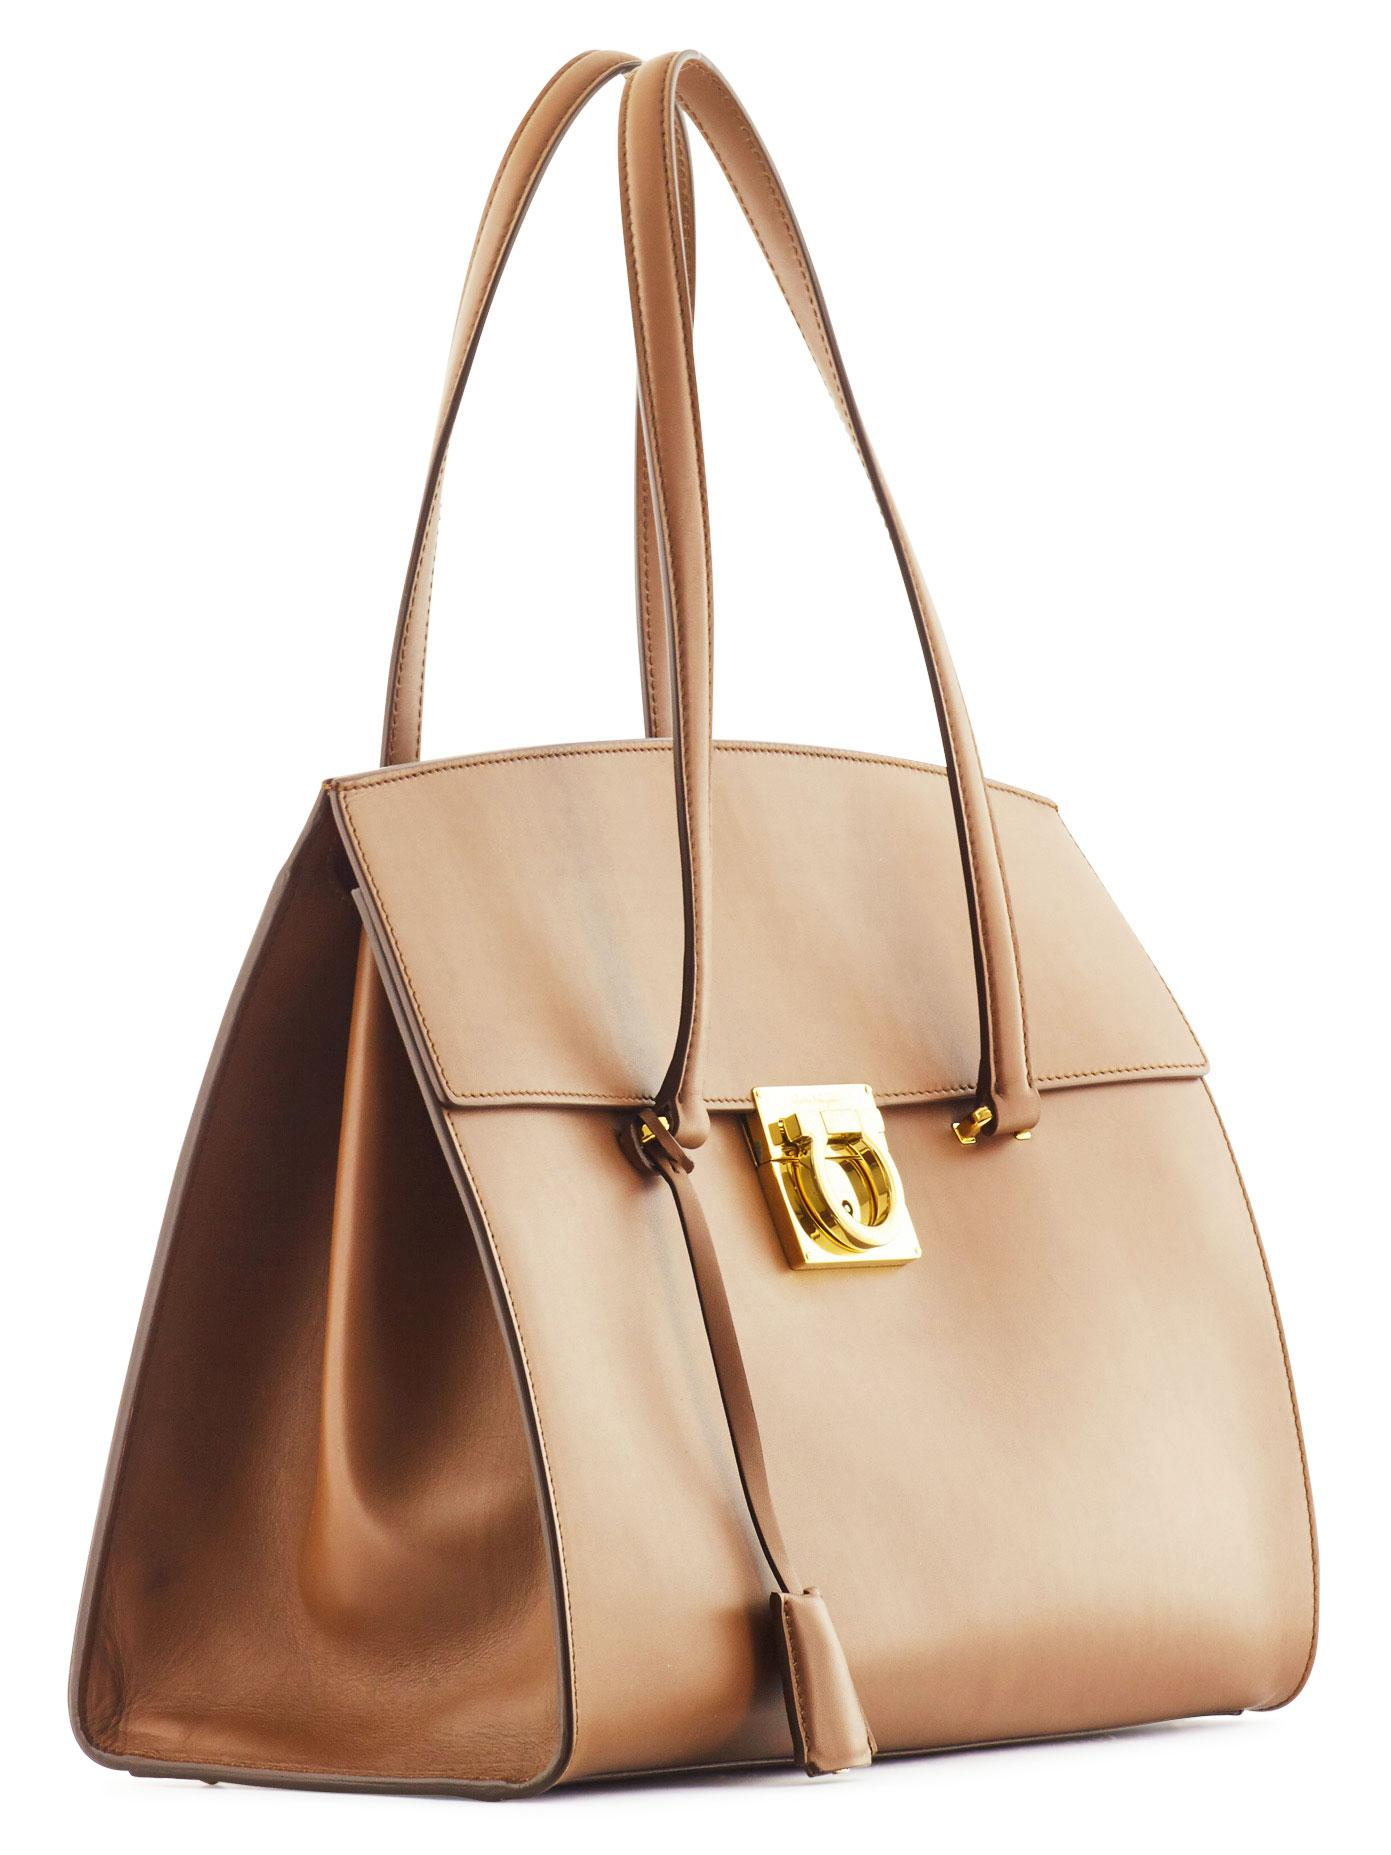 Ferragamo Leather Mara Carry-all Tote Bag in Bronze (Brown)